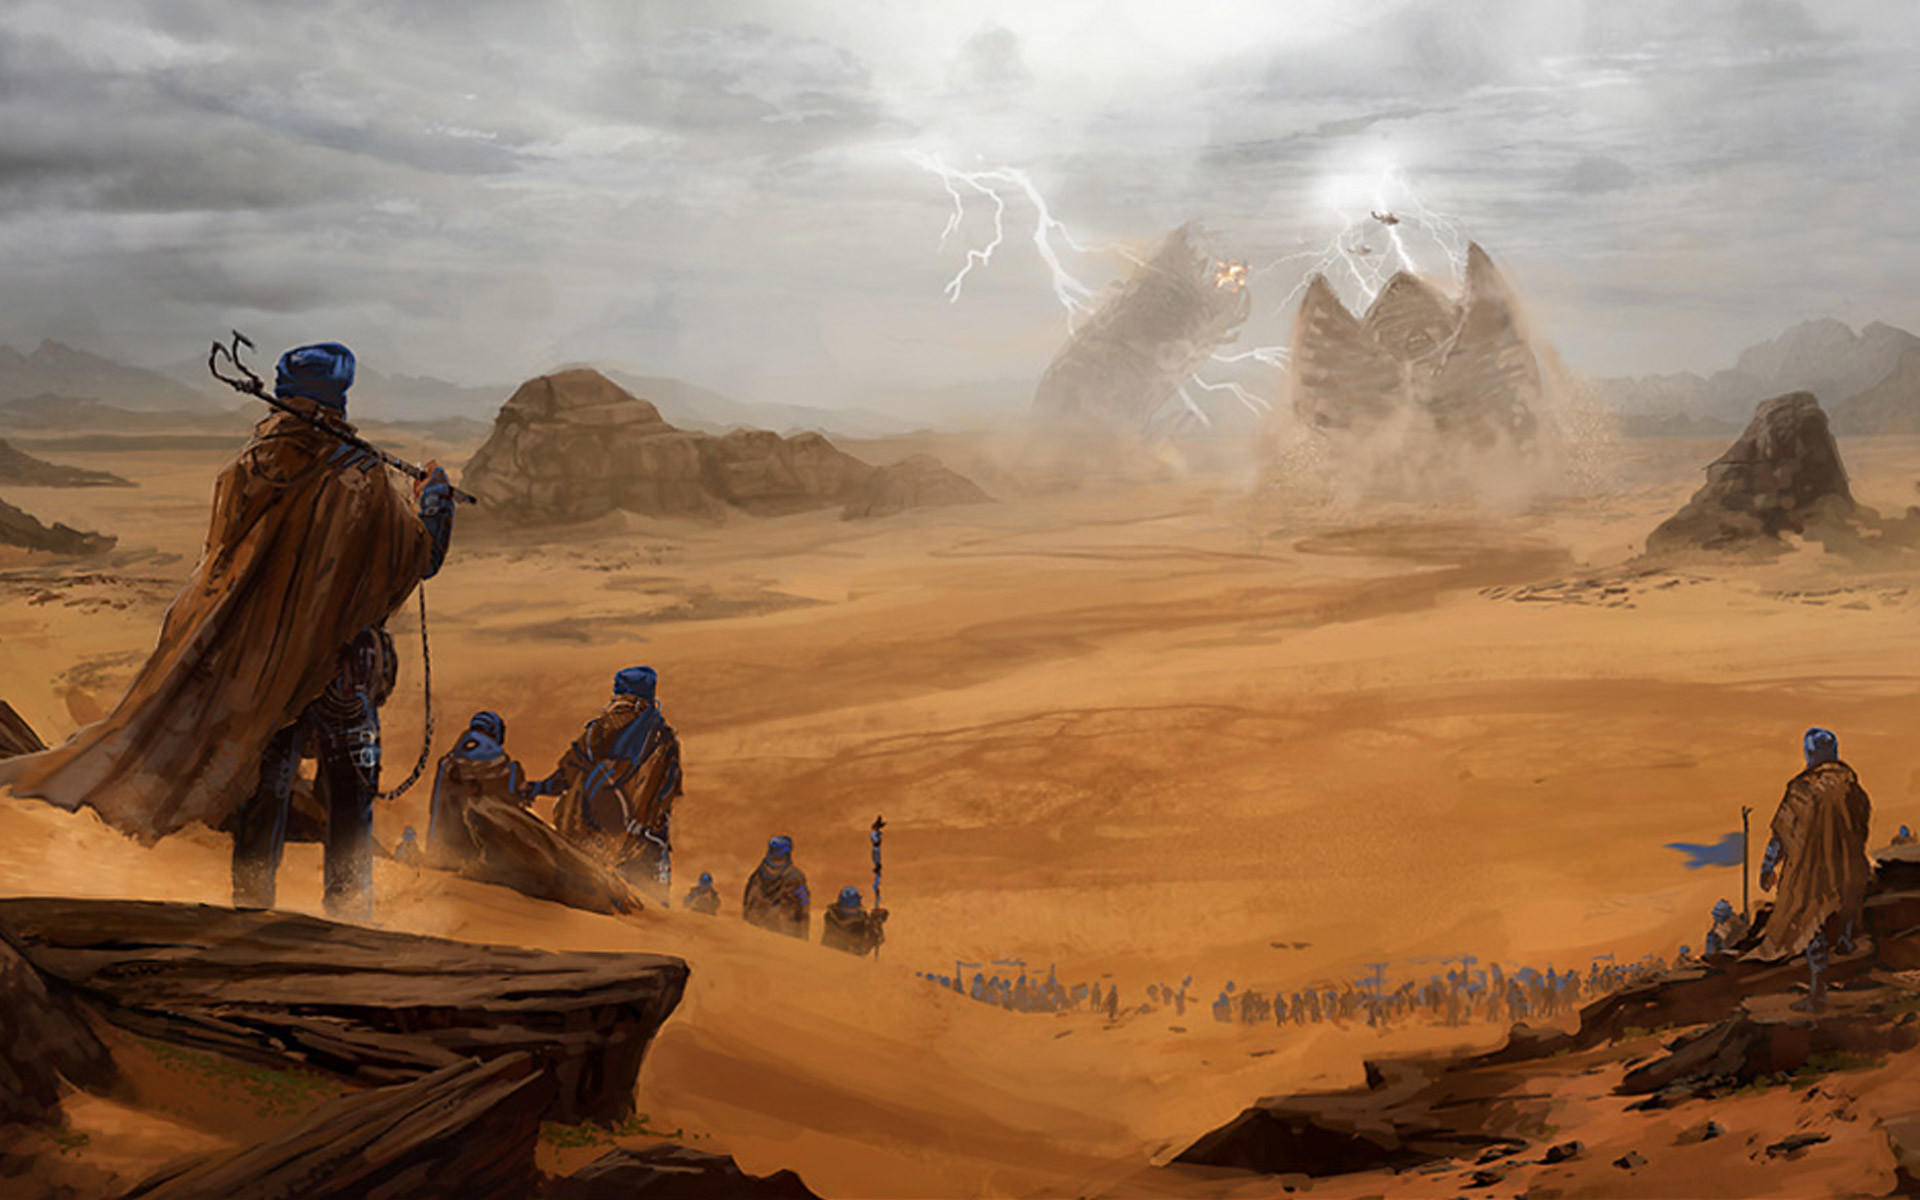 wallpaper-ambrosia-literatura-duna.jpg (1920×1200)   Dune   Pinterest   Dune